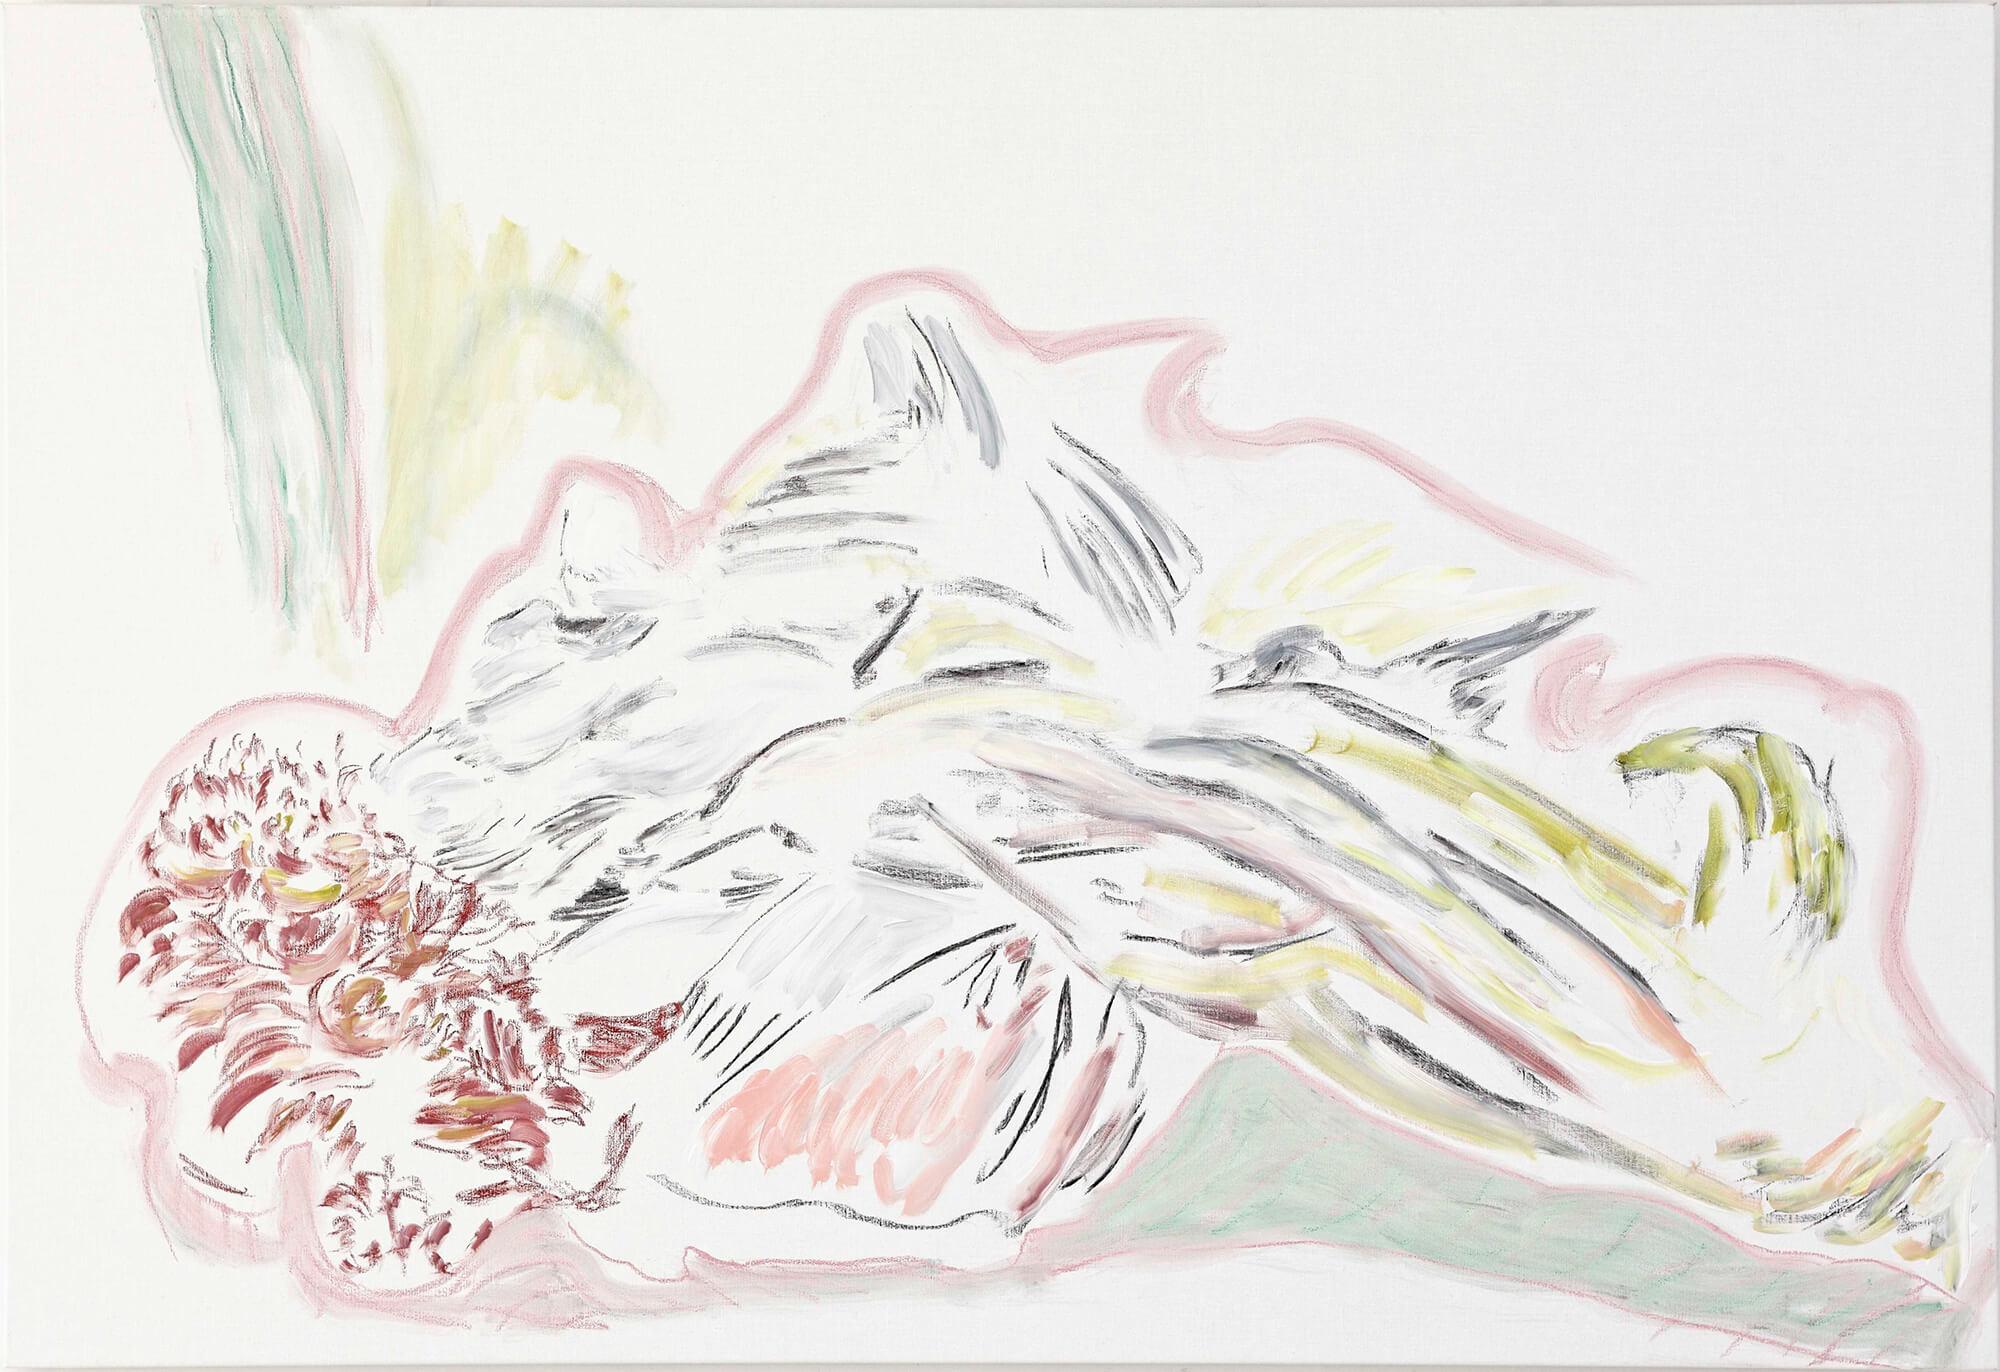 Colline de papier (acrylic and mixed media, 130 x 190 cm - 2013)